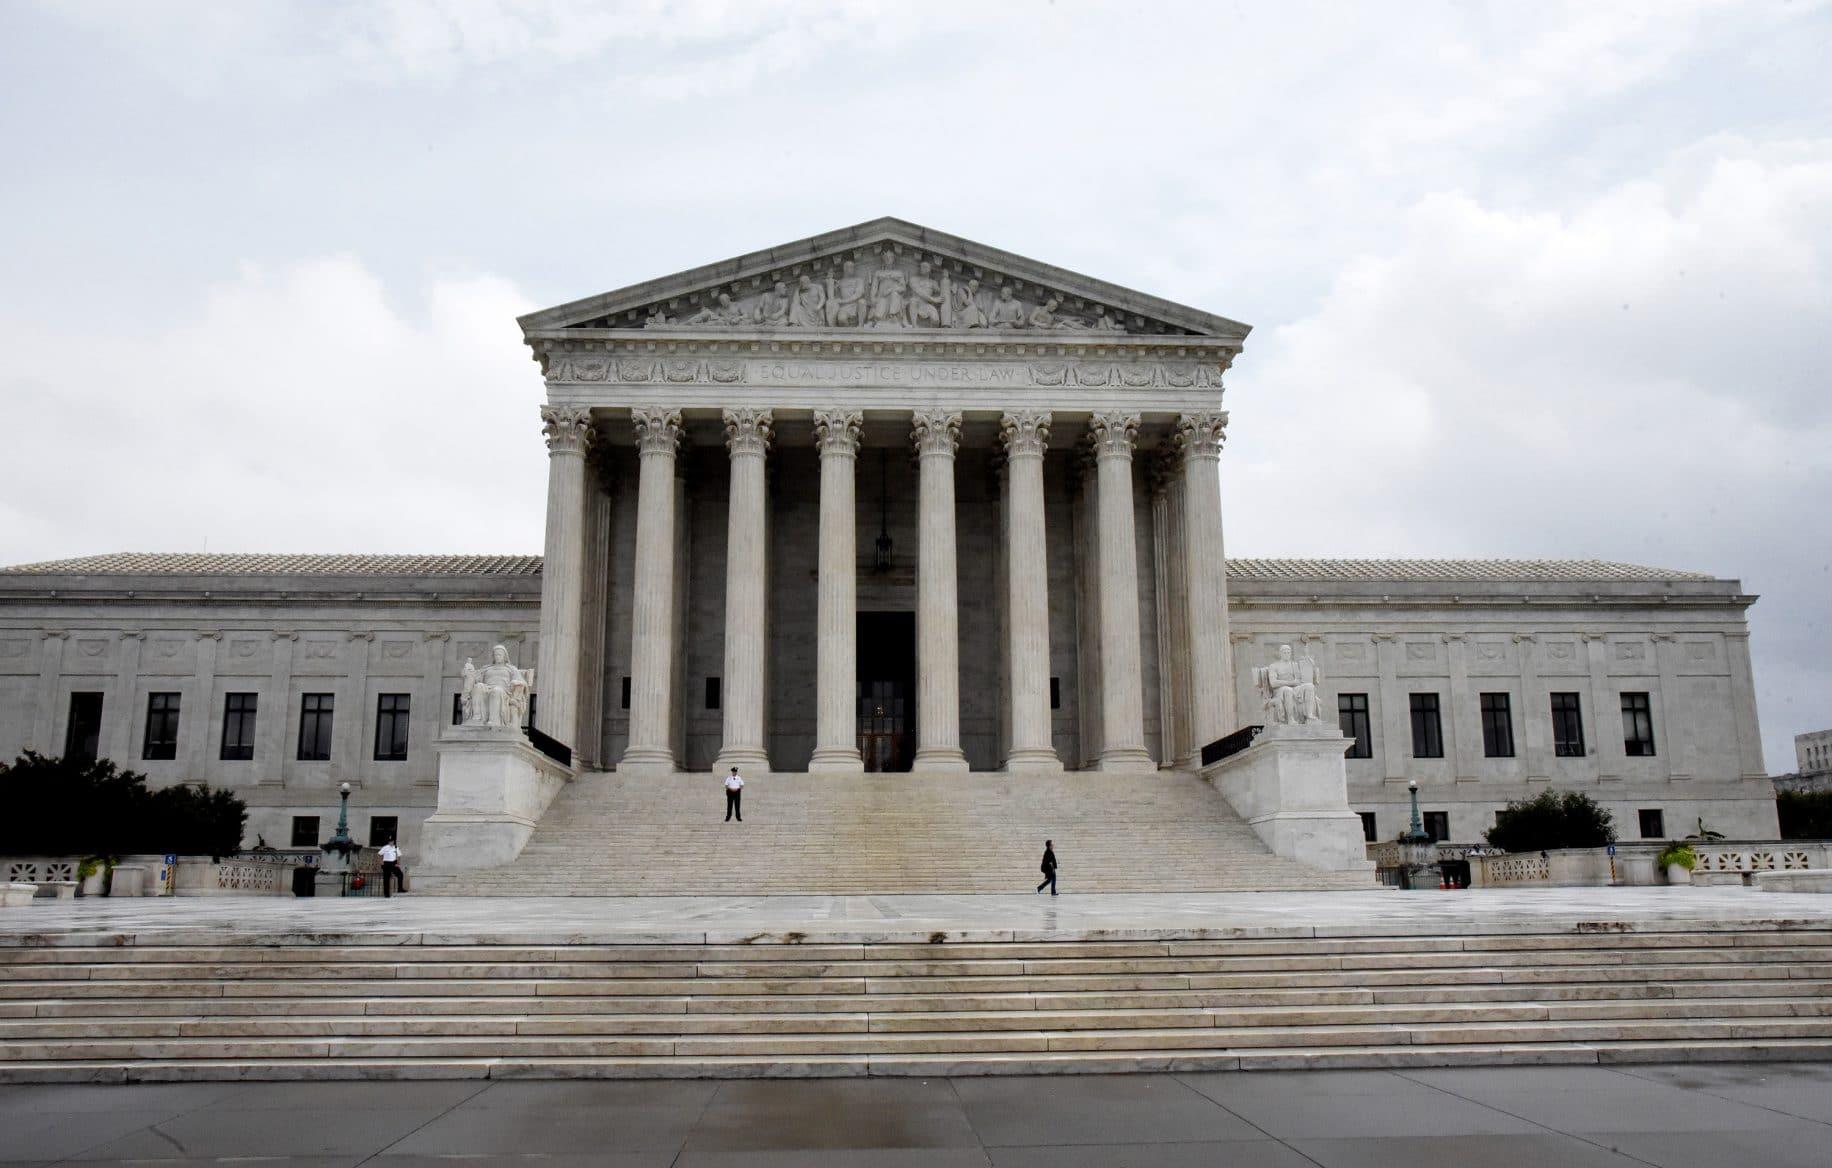 Supreme Court secrecy breach sheds light on internal dynamics